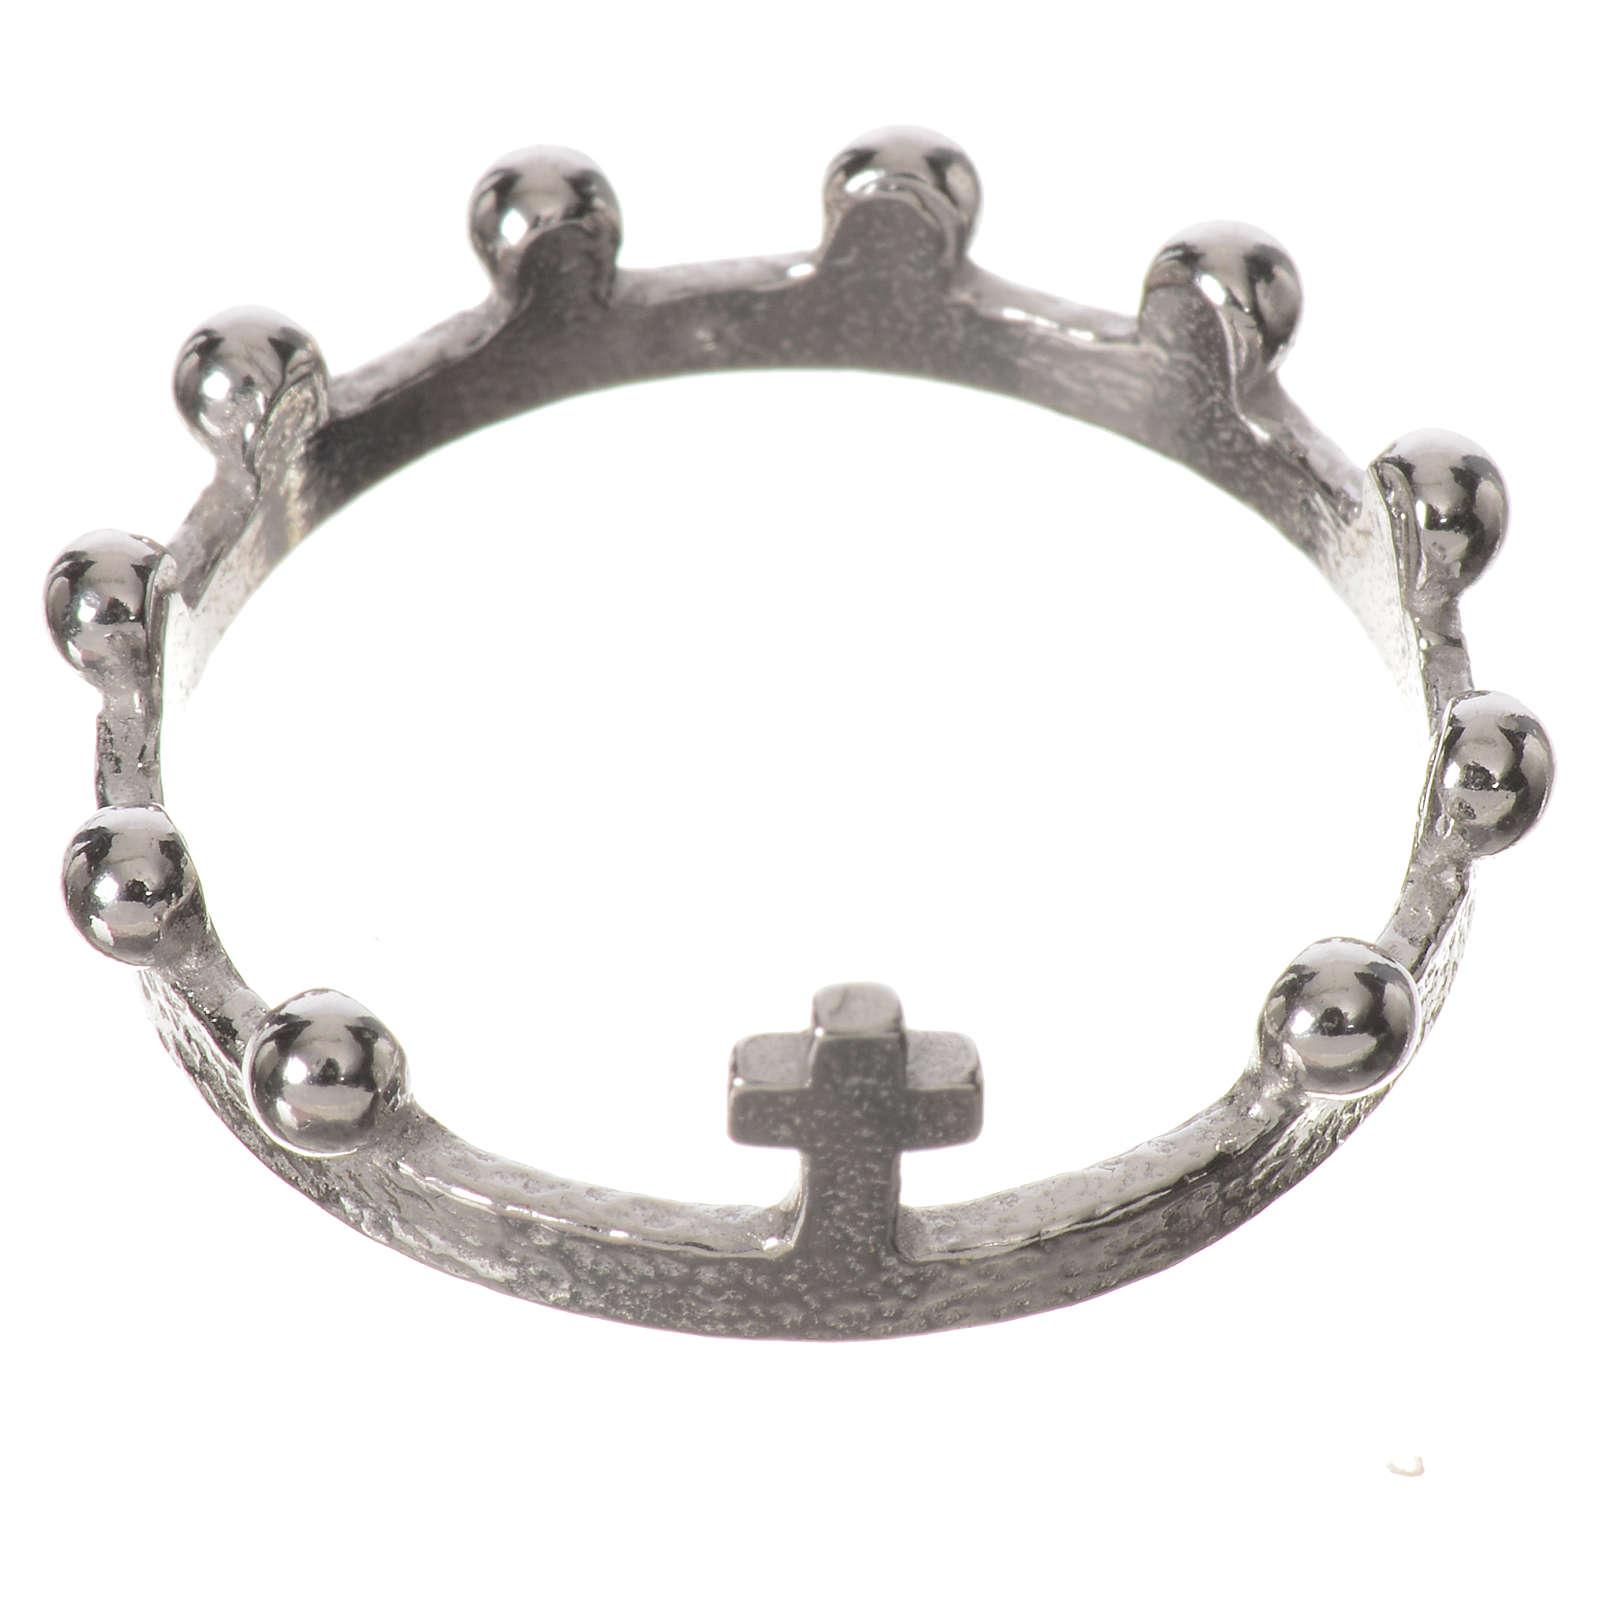 Single decade prayer ring in 925 silver 3